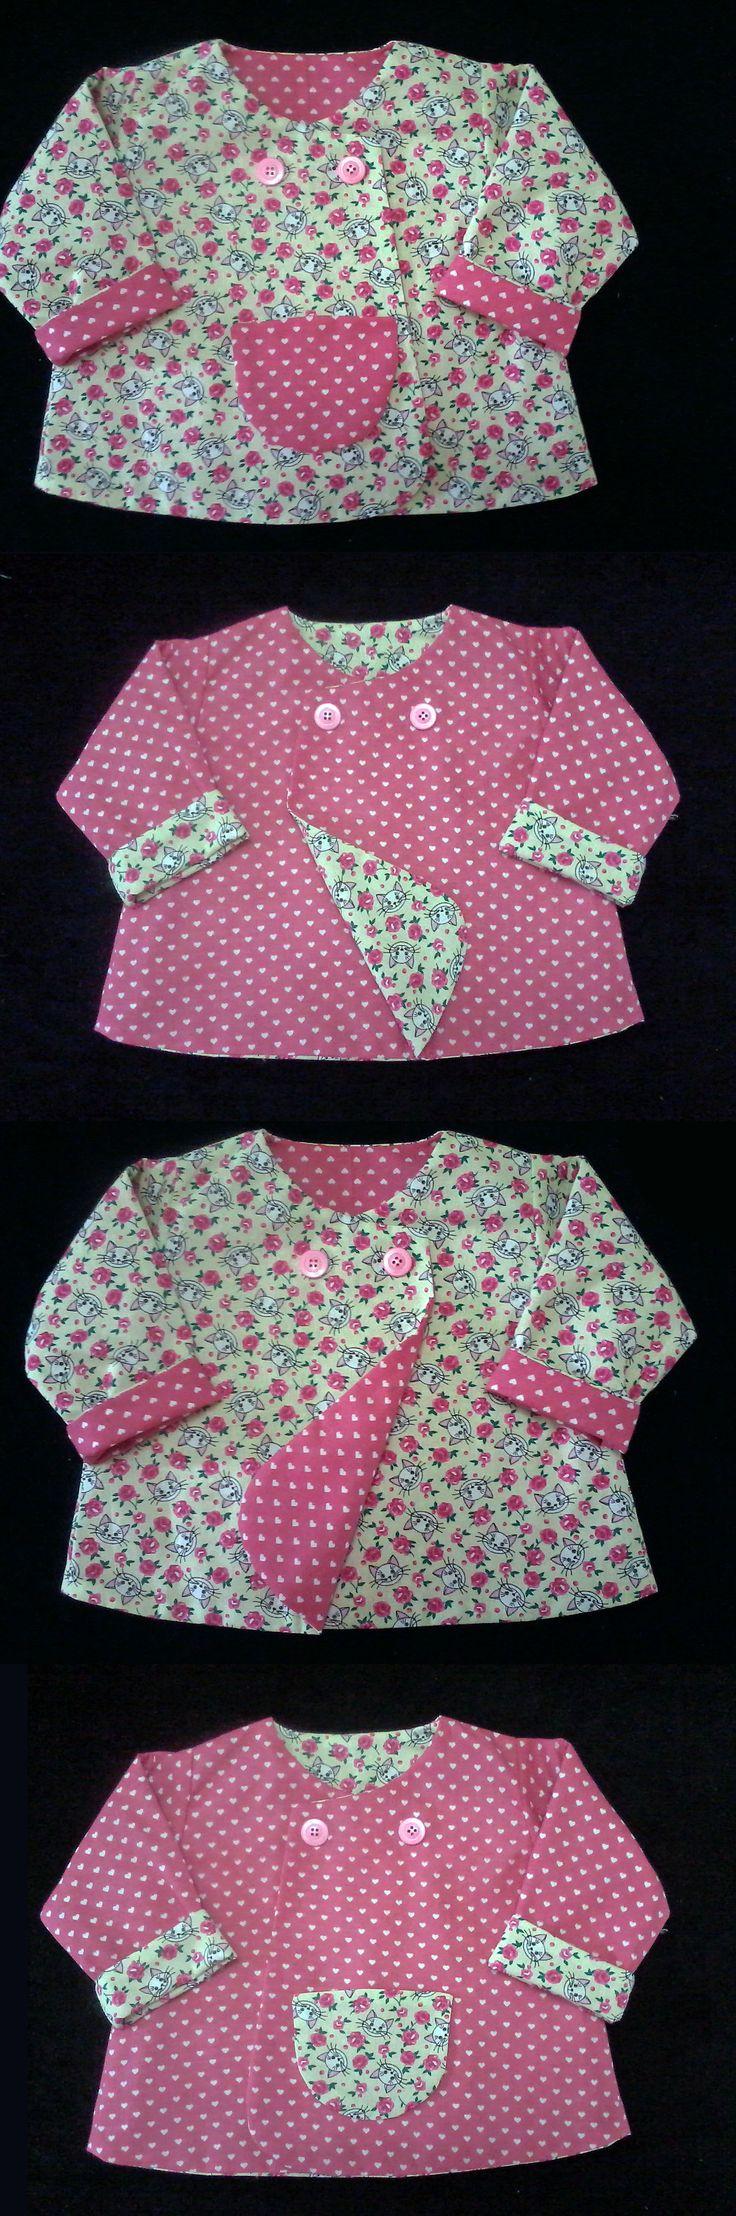 Casaco Dupla Face Rosa  6-12m - Pink Reversible Coat -  6-12mo................................Molde Gratuito - Free Pattern ......................https://www.facebook.com/groups/1594730384185604/......(RLevyFile-CasacoDuplaFaceRosa6-12m-PinkReversibleCoat-6-12mo)